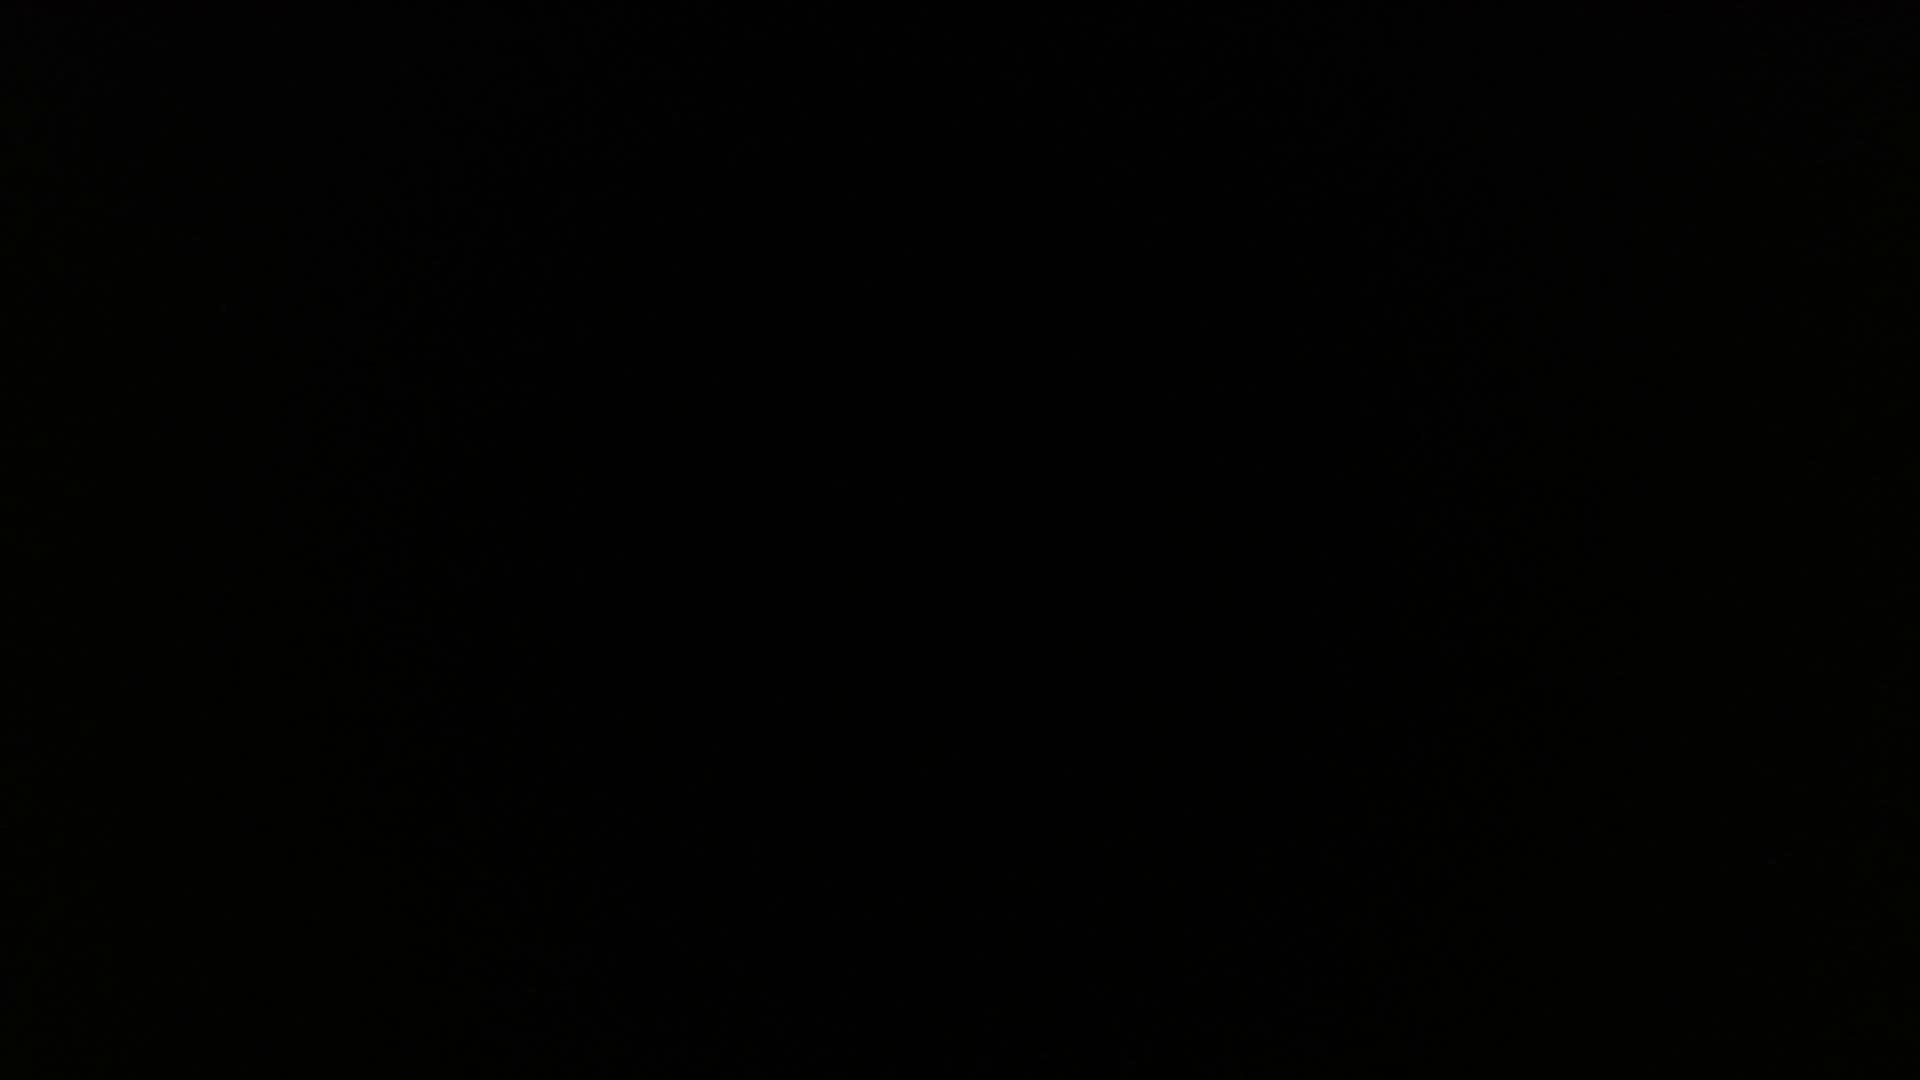 SPYさん初投稿!マンション覗き!5000K!ハイビジョン撮影VOL.03(元野球部社会人編) スポーツ系メンズ ゲイAV画像 11画像 6